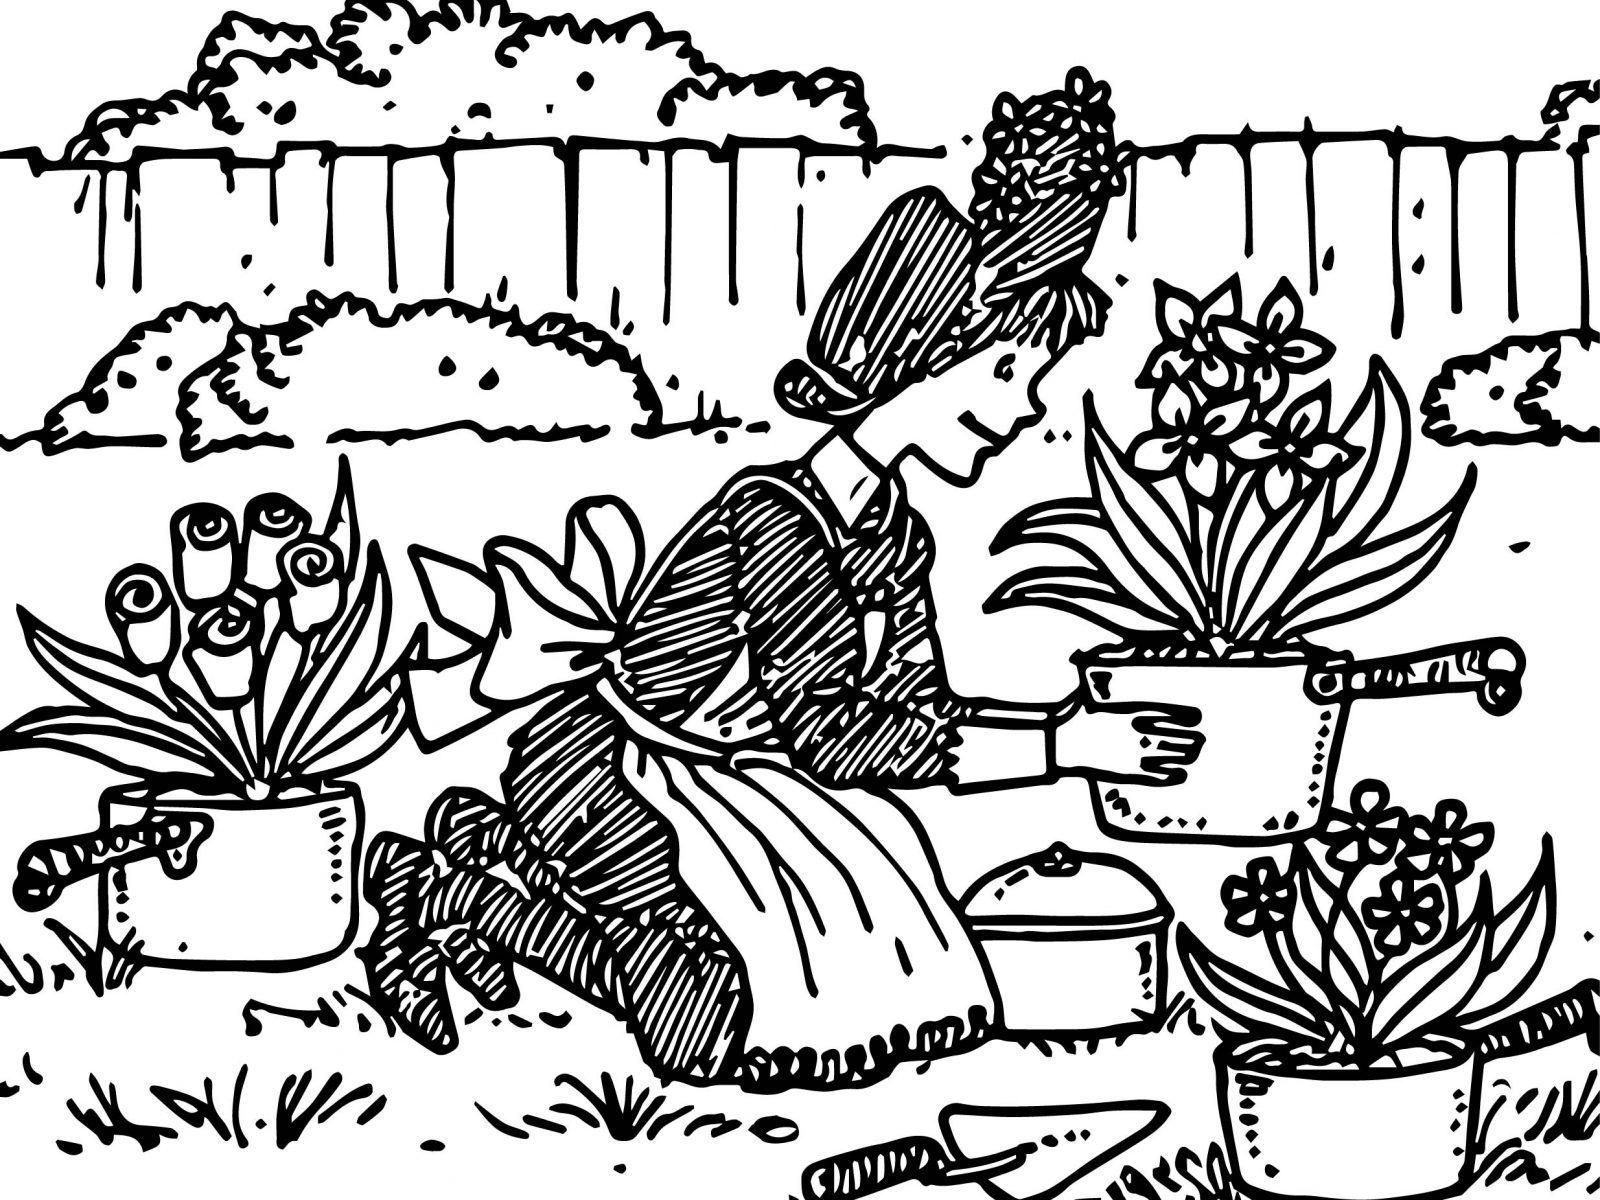 Amelia Bedelia Coloring Page At Getdrawings